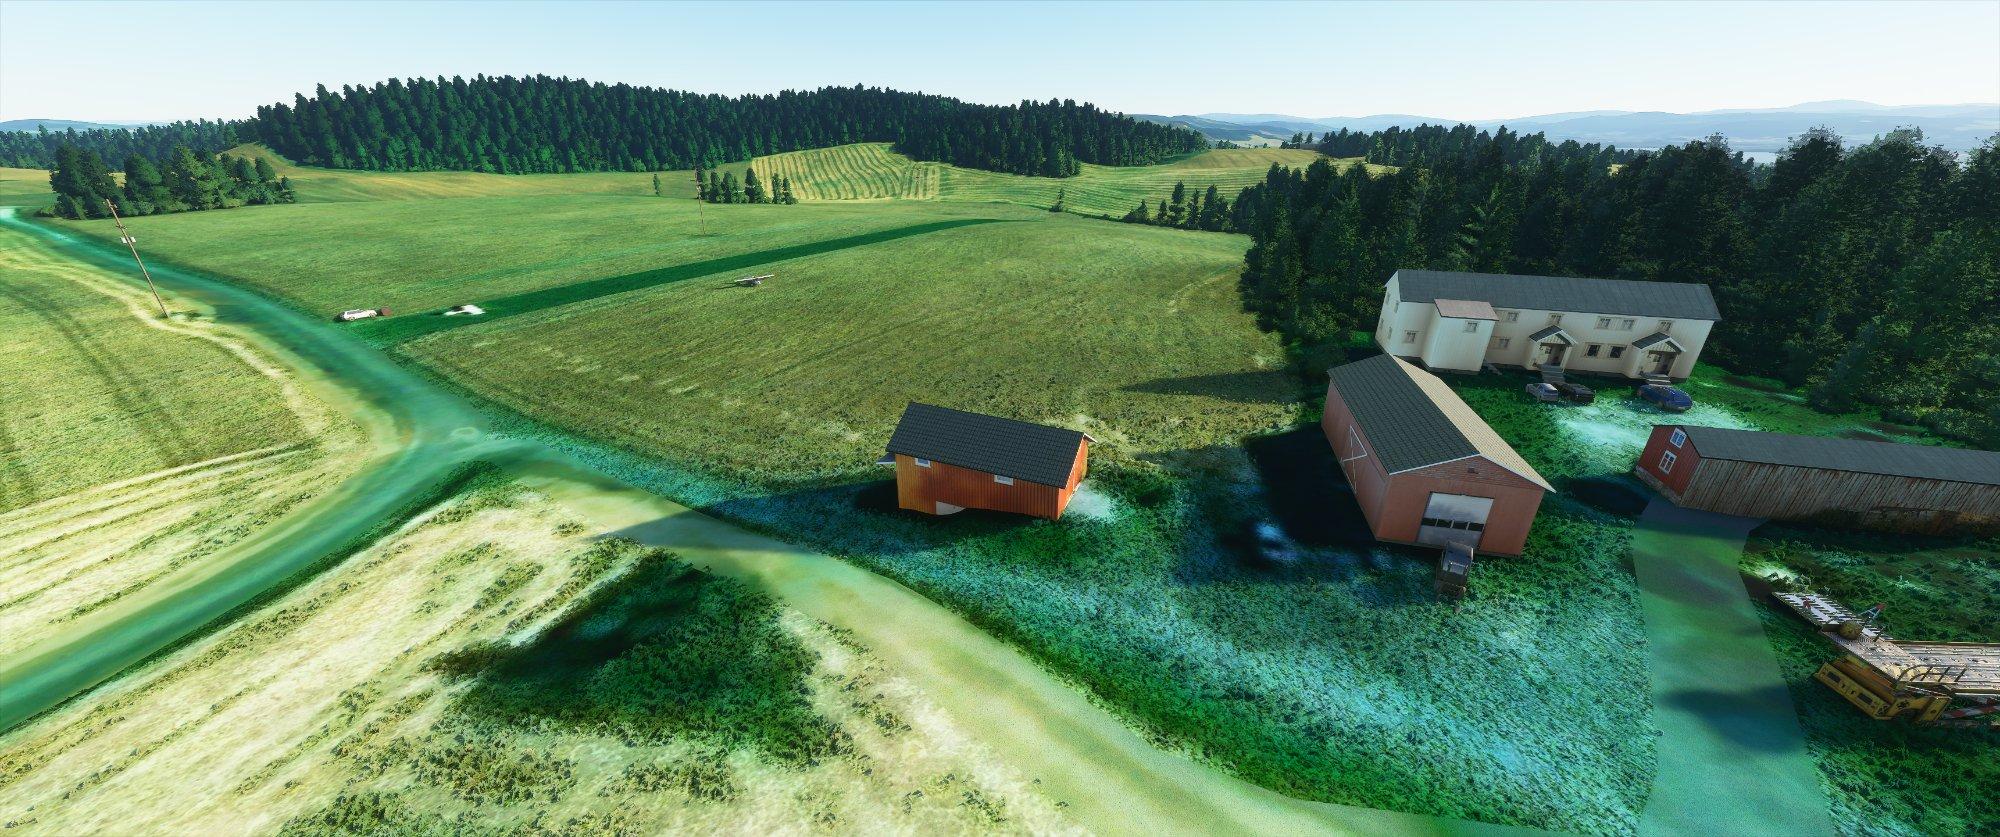 Microsoft Flight Simulator Screenshot 2020.10.07 - 19.19.59.50.jpg